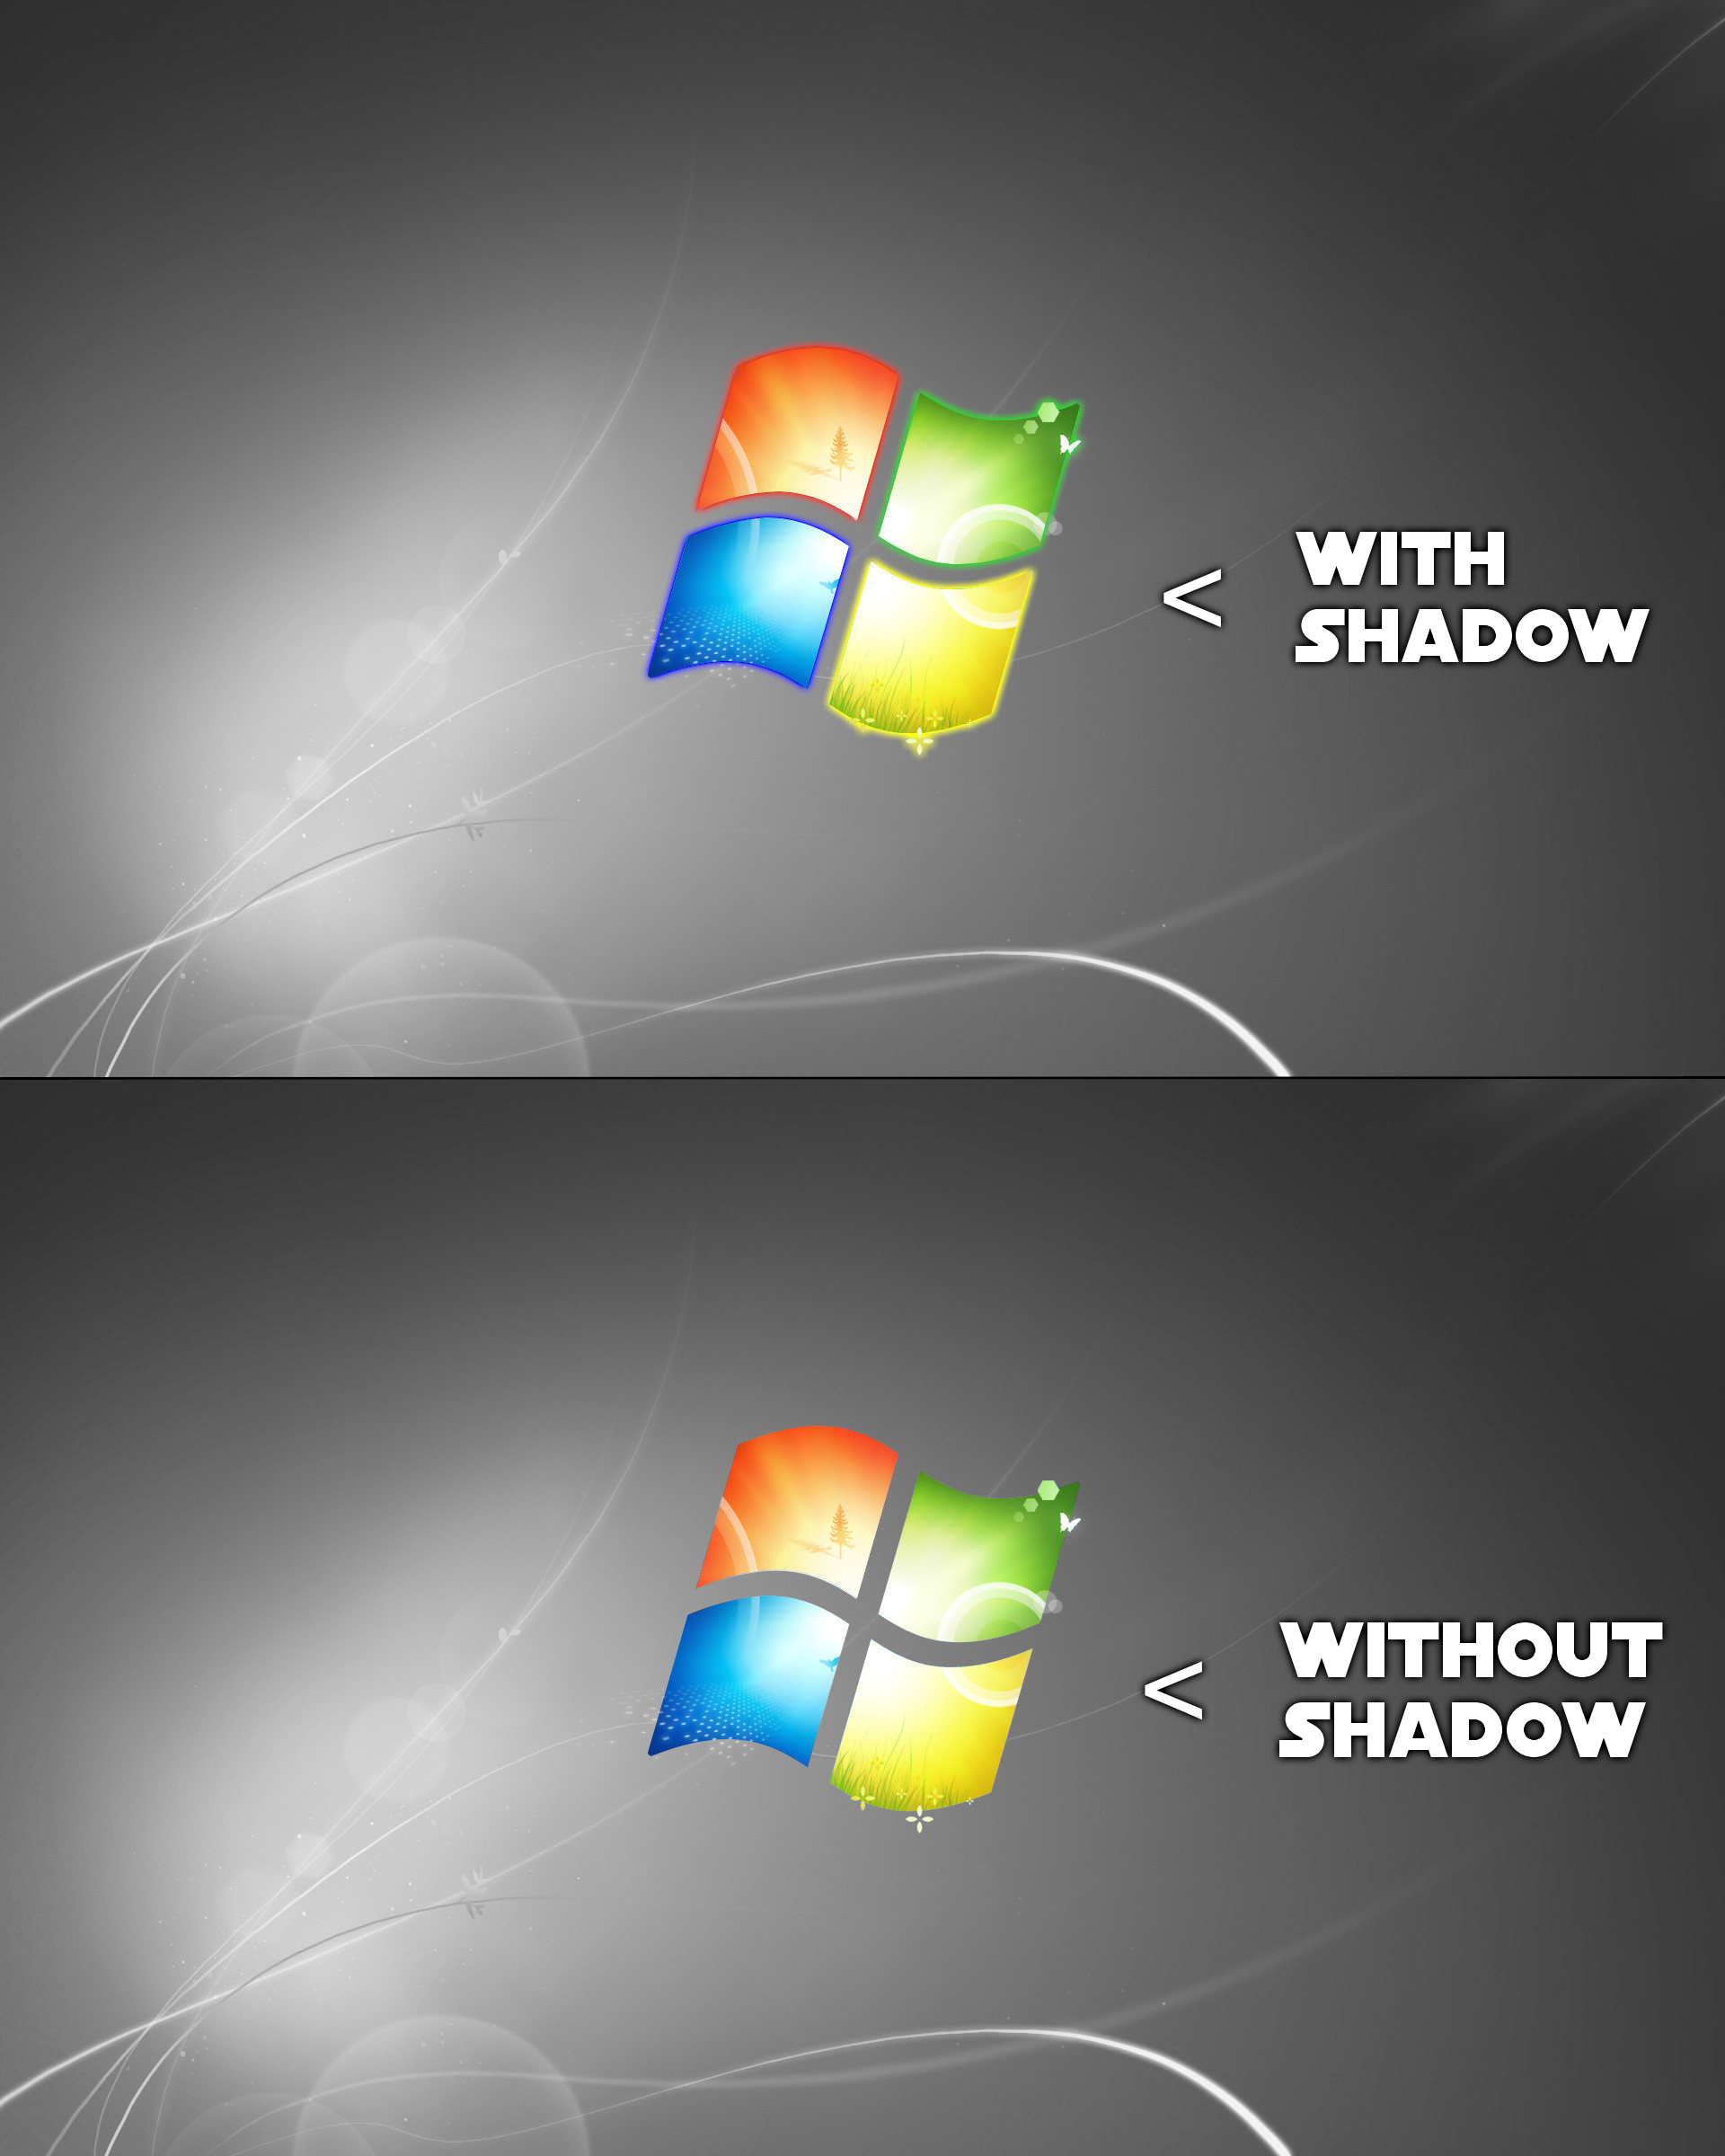 Windows 7 Black Wallpaper By Enoninja On Deviantart